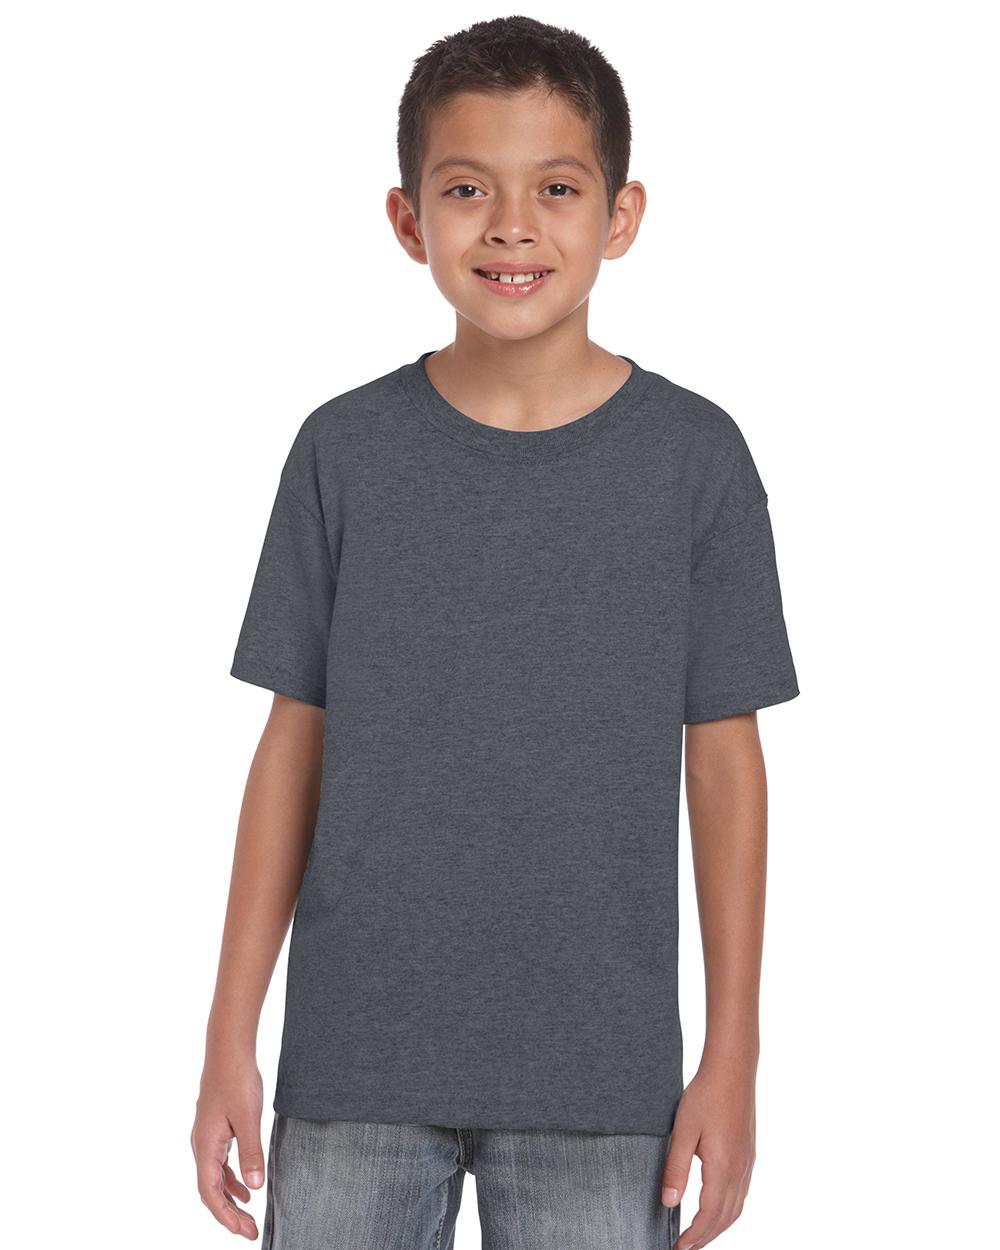 Gildan 8000B     DryBlend™    Classic Fit Youth T-Shirt    5.6 oz. 50% Cotton/50% DryBlend Polyester